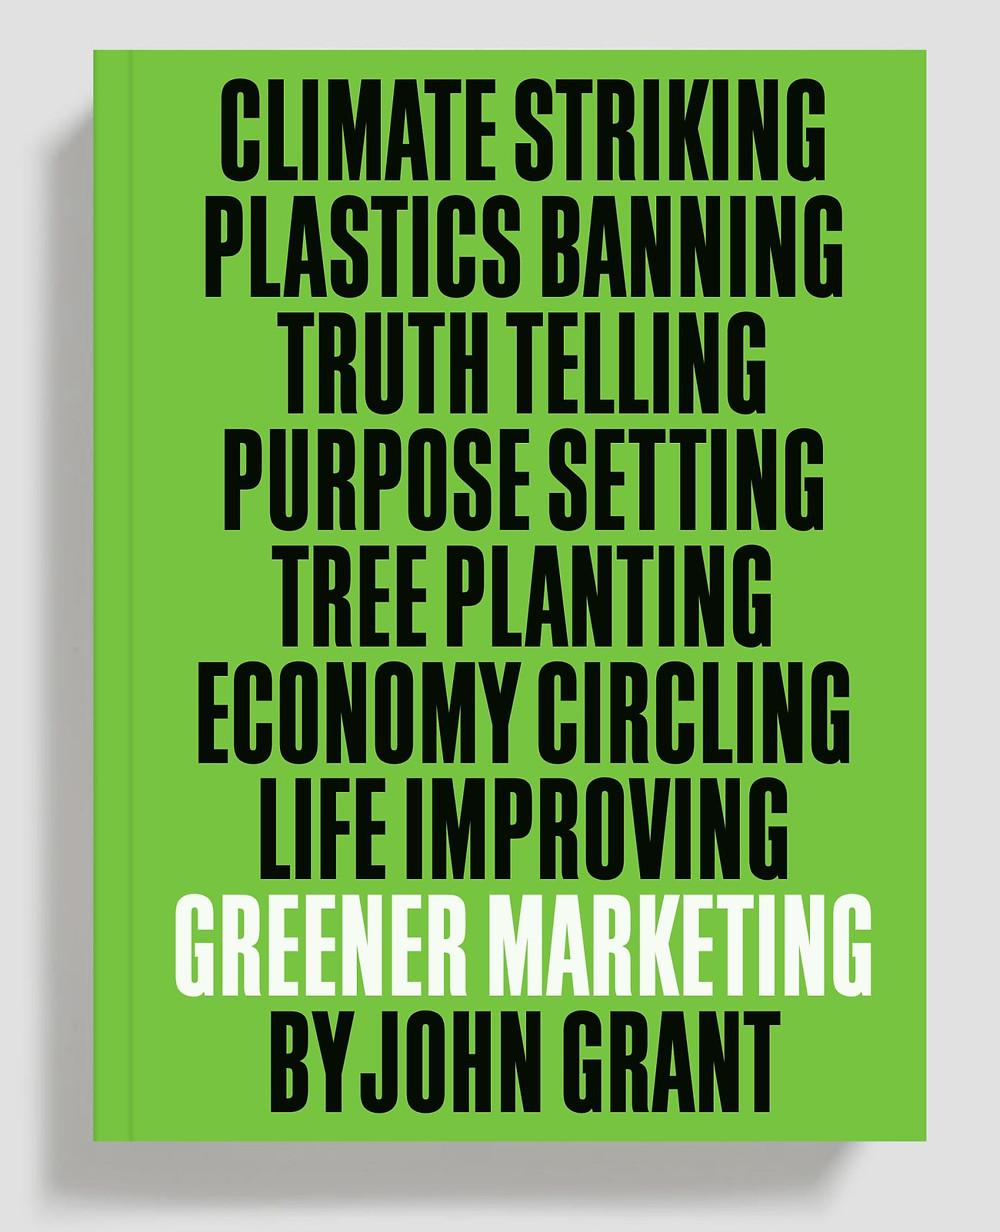 Greener Marketing by John Grant